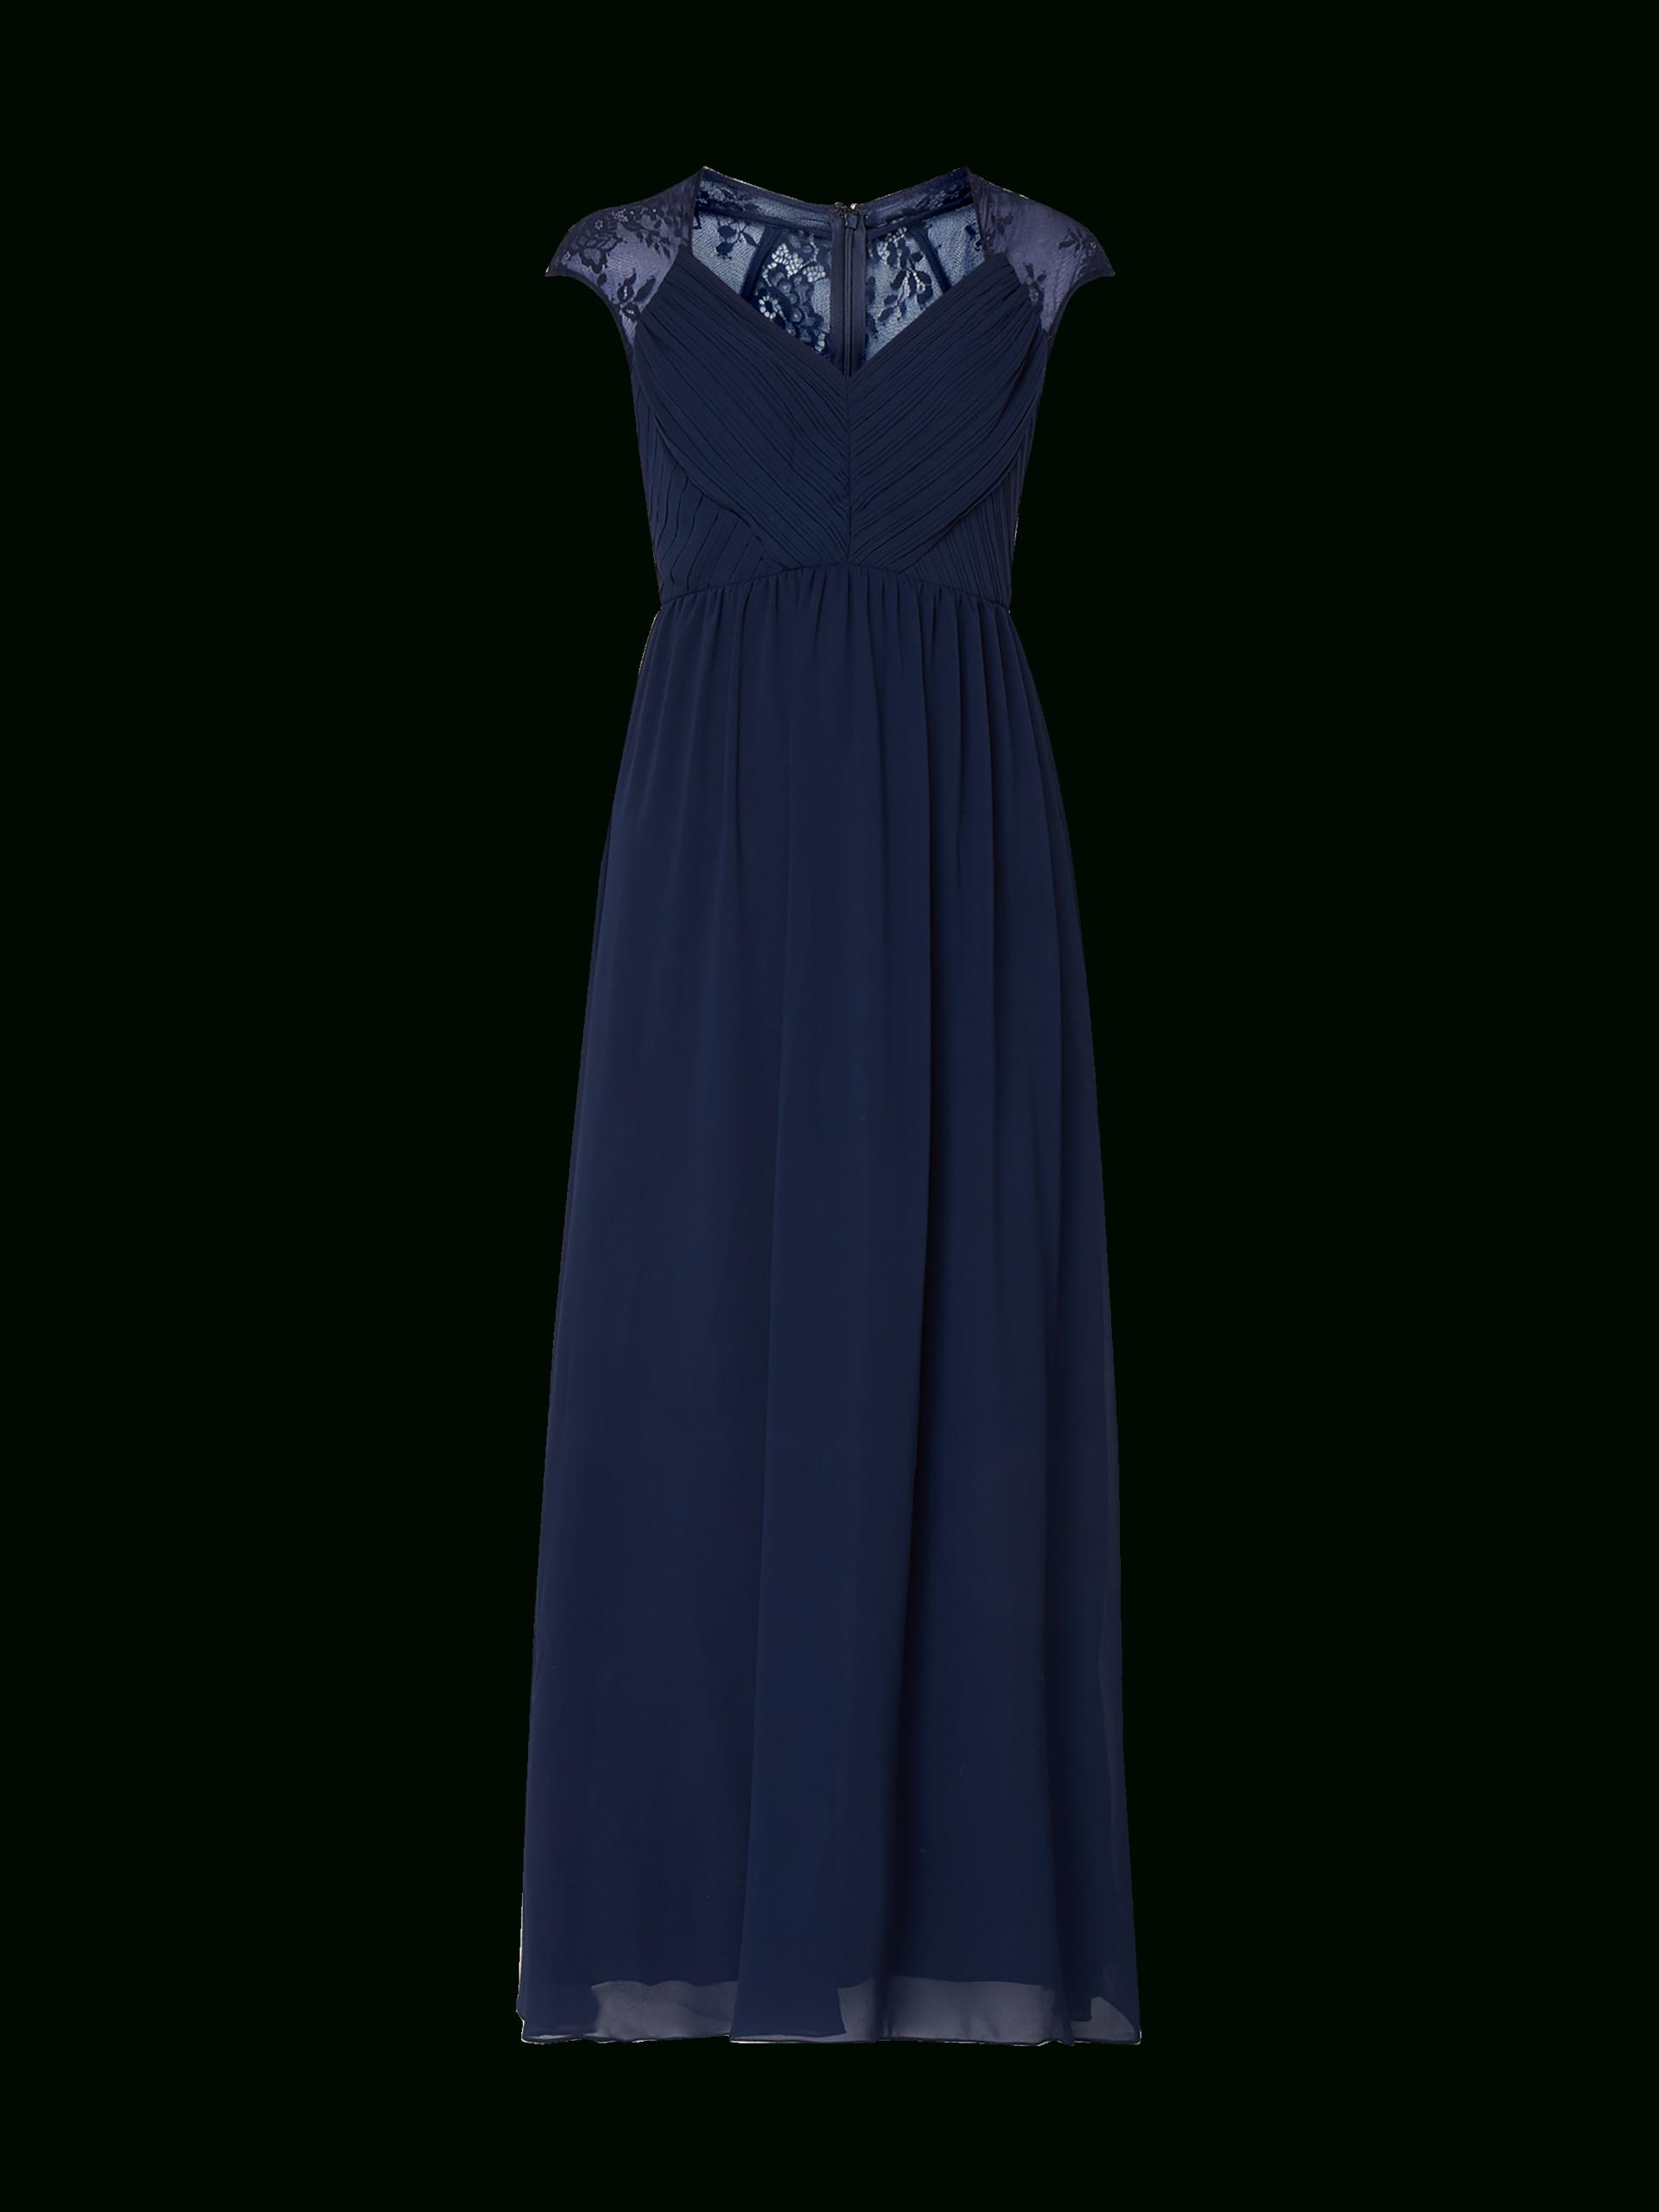 10 Cool Yas Abendkleid Design15 Cool Yas Abendkleid Ärmel